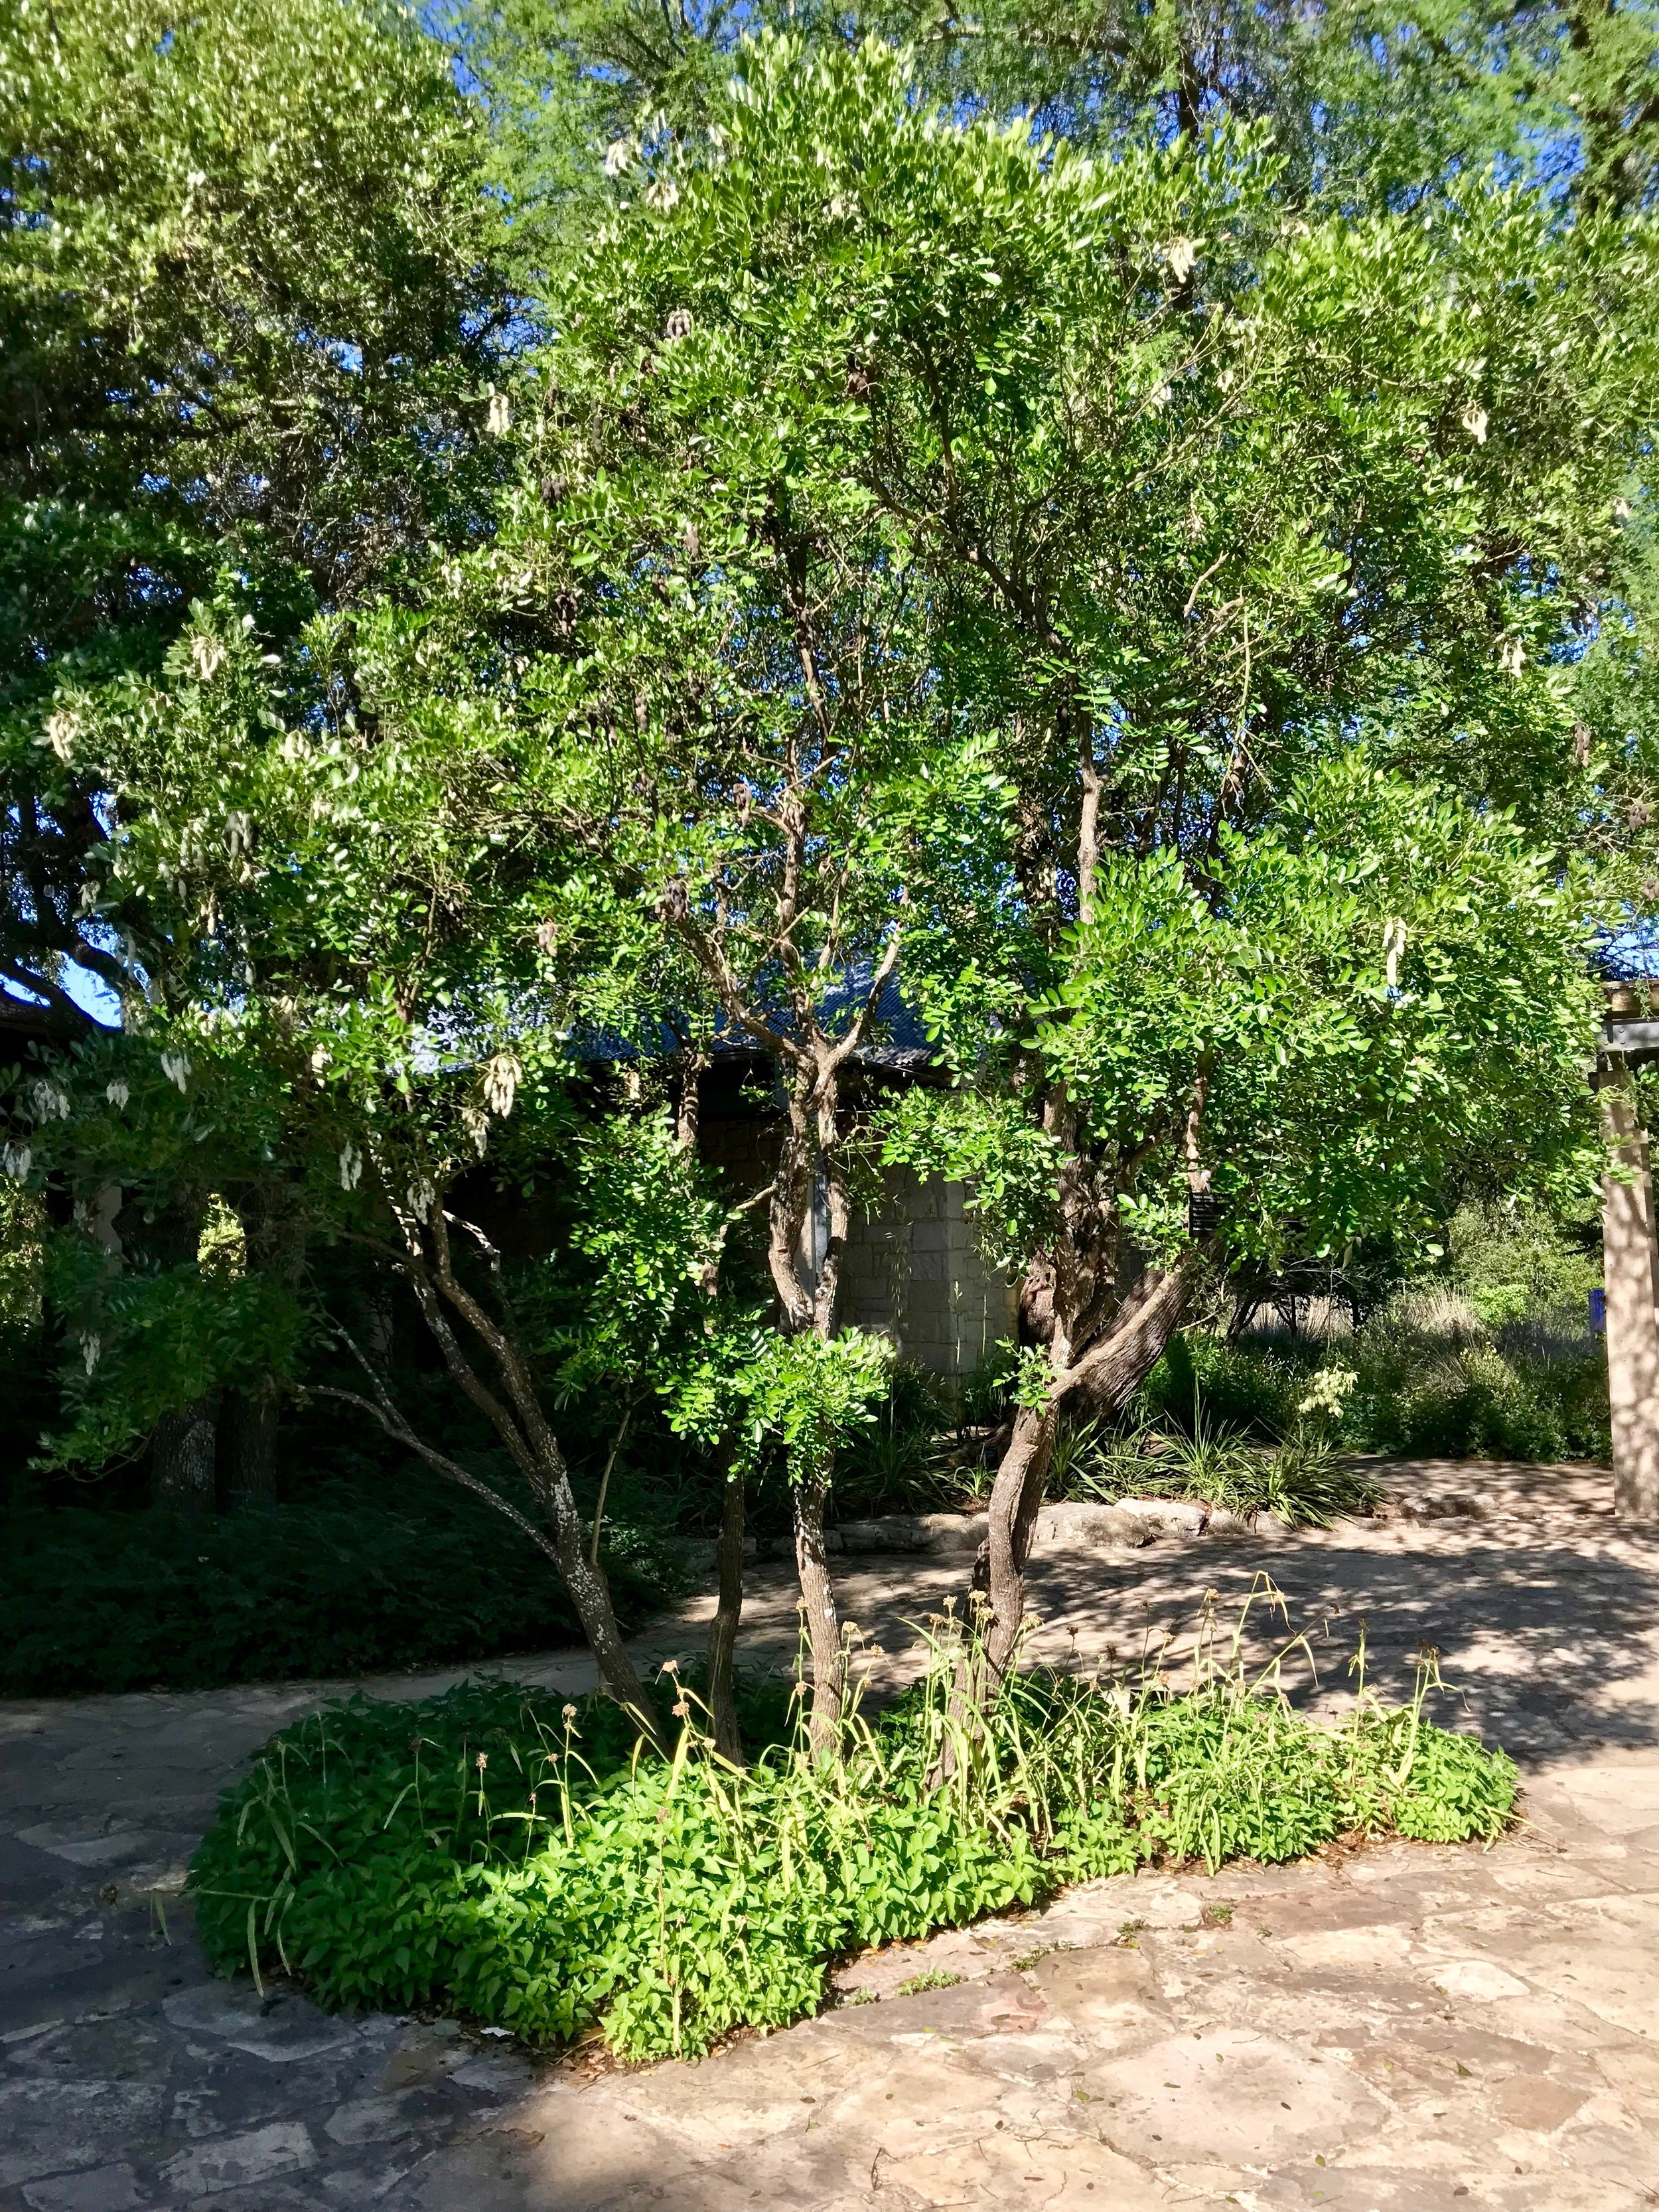 The courtyard's Texas Mountain Laurel, on a sunnier day